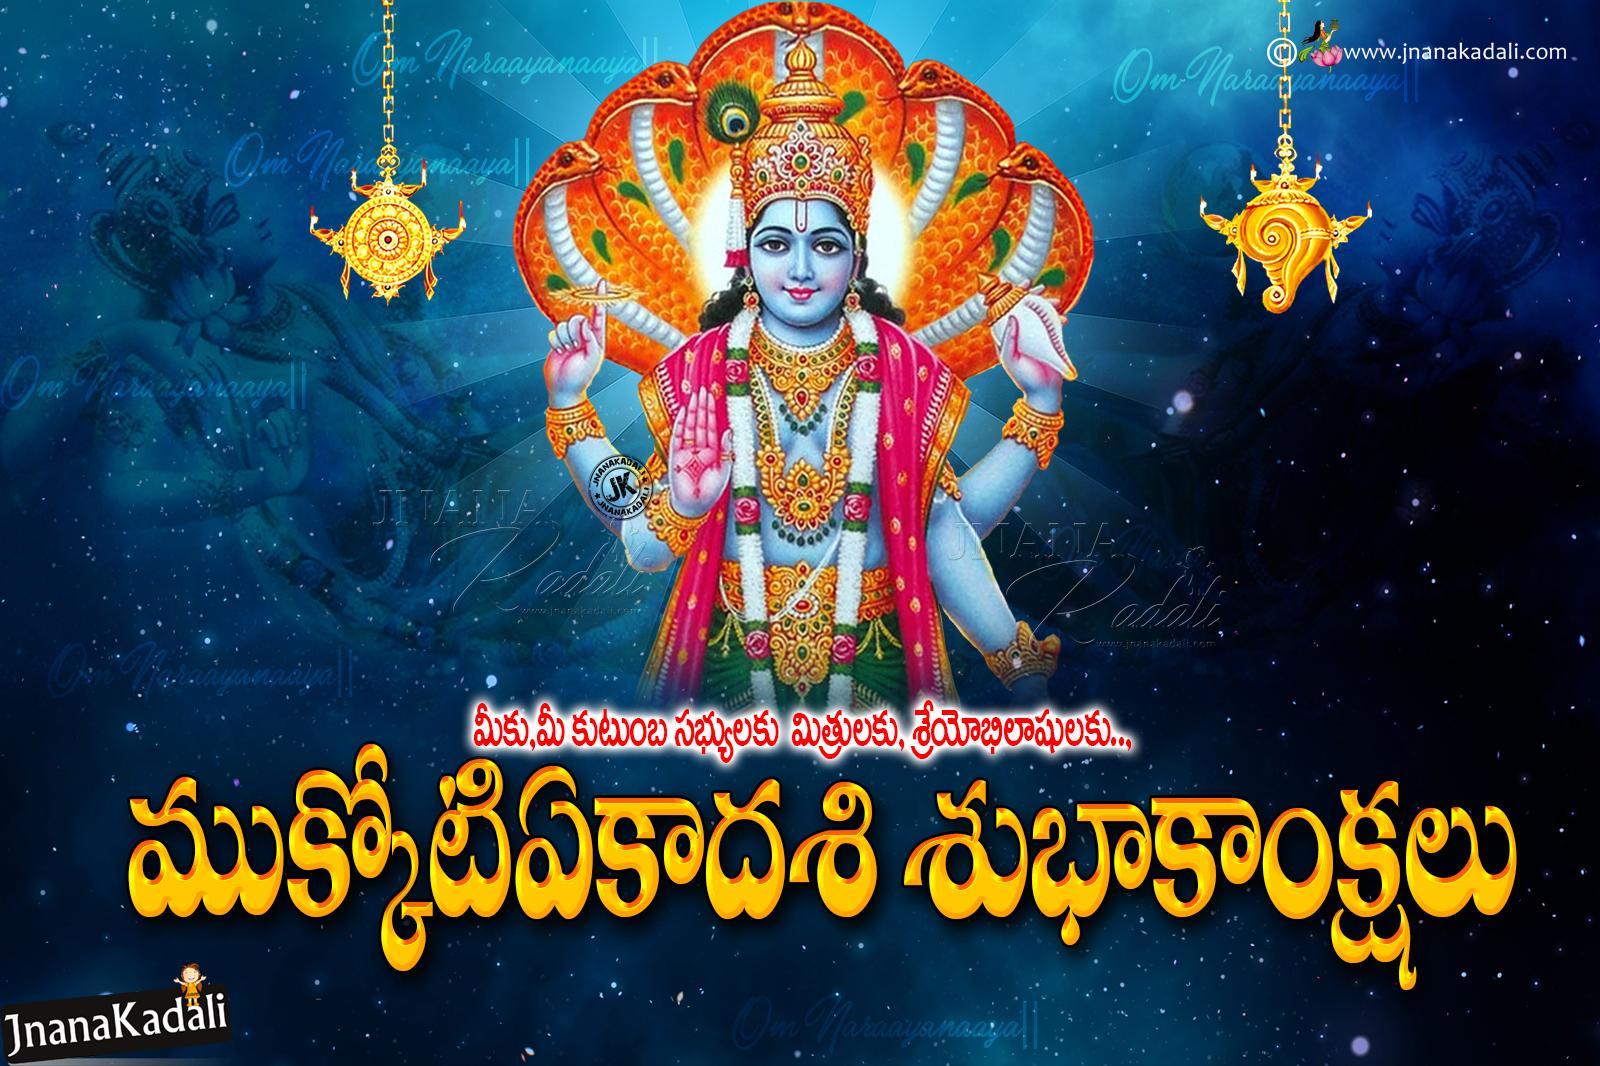 Download Wallpaper Lord Mahavishnu - telugu%2Bmukkoti%2Byeakadashi%2Bgreetings%2Bhd%2Bwallpapers-jnanakadali  Photograph_701277.jpg